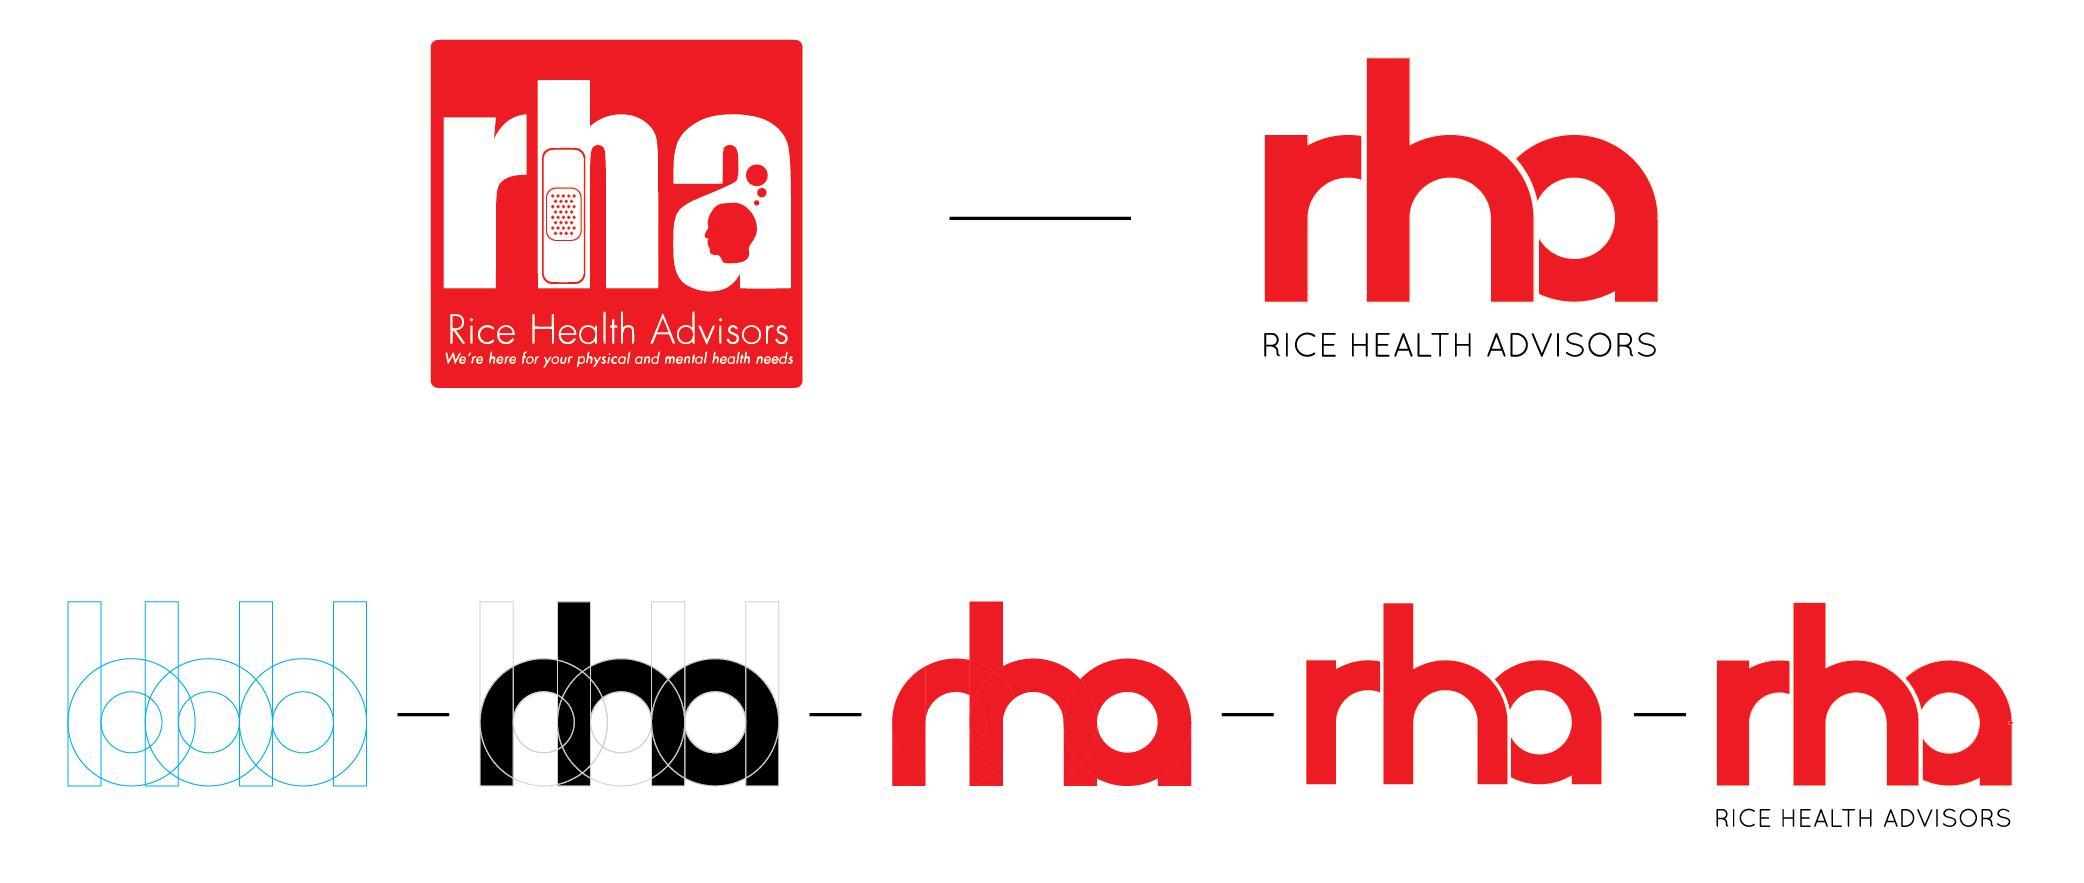 Updated look for Rice Health Advisors program